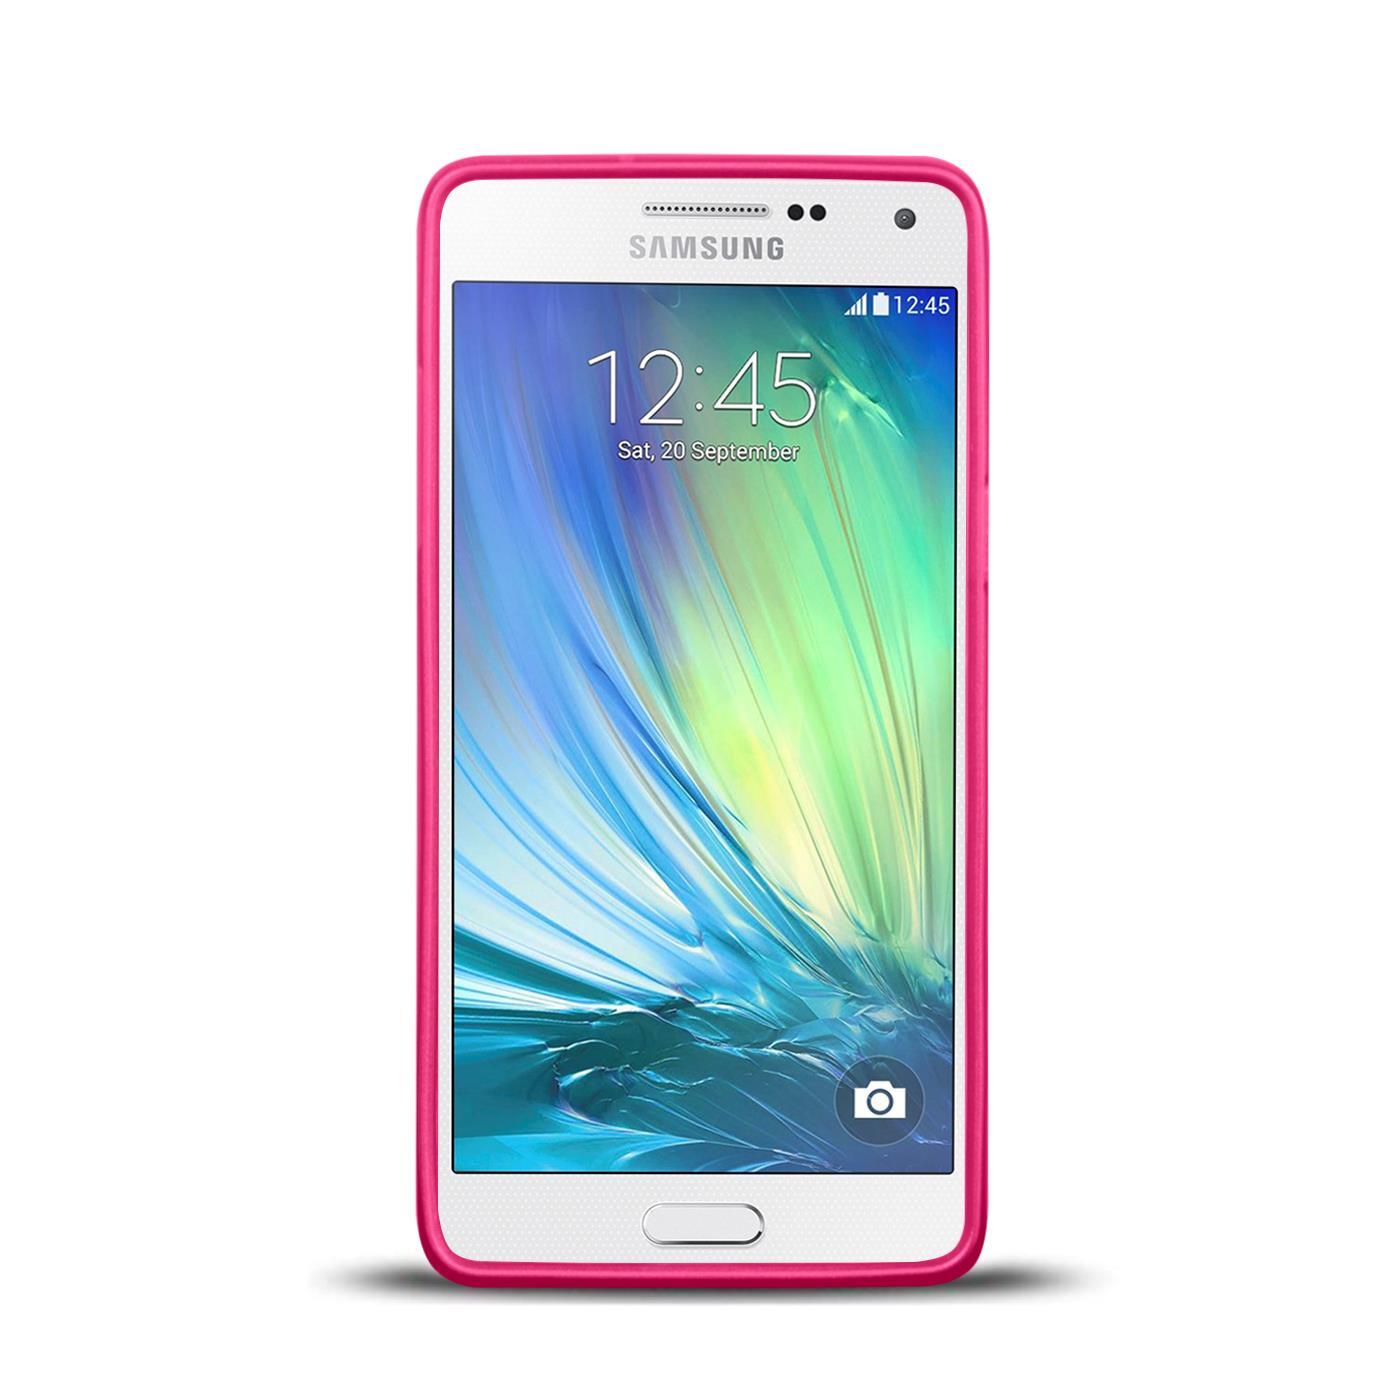 Silikon-Bumper-Case-Samsung-Galaxy-a5-2015-Ultra-Slim-Stossfeste-Rueckschale Indexbild 15